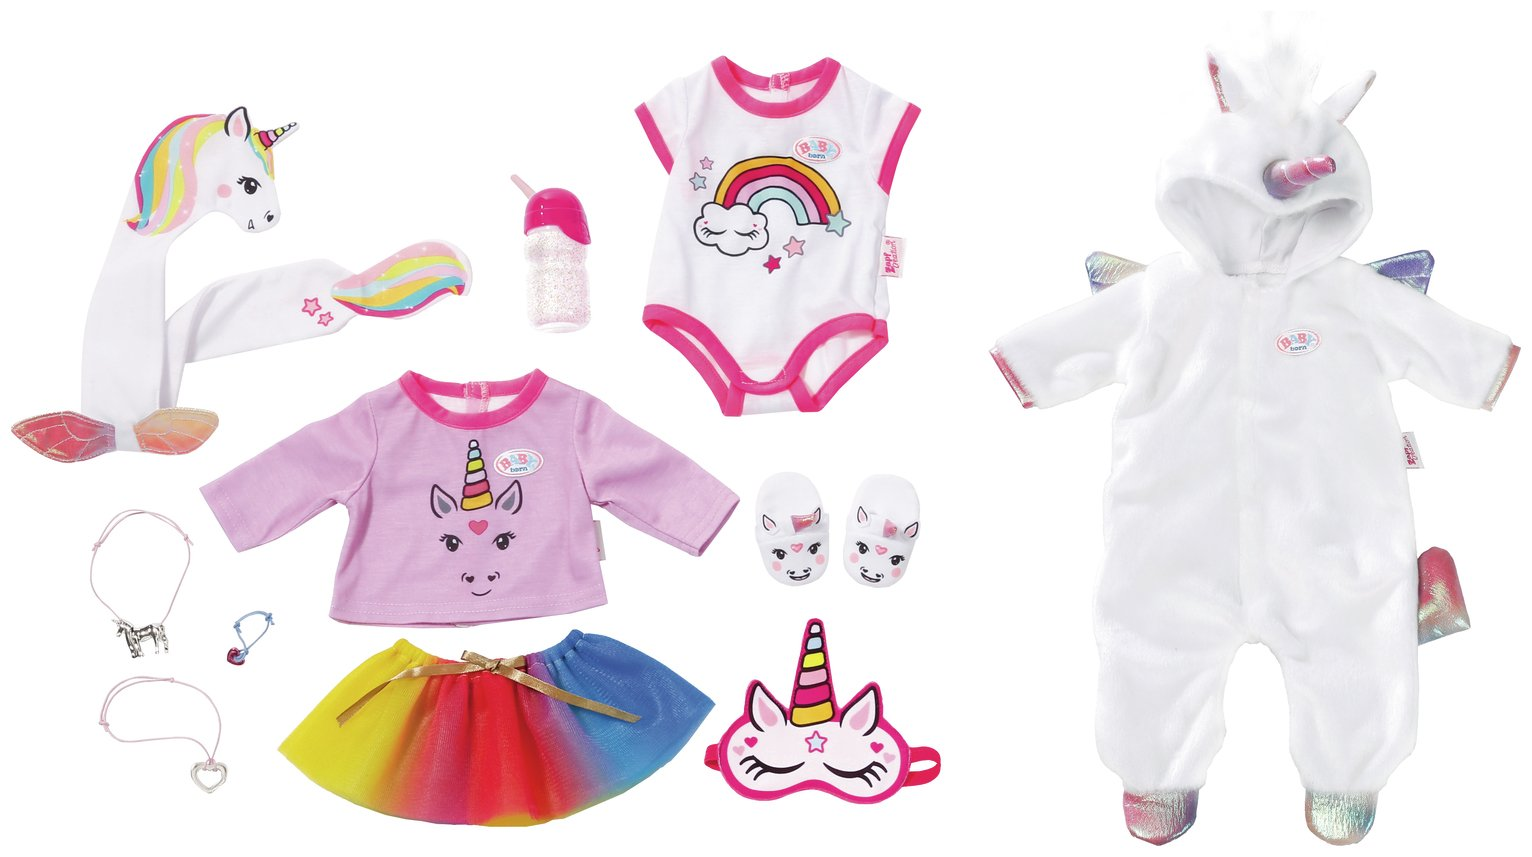 BABY born Unicorn Onesie and Accessory Set